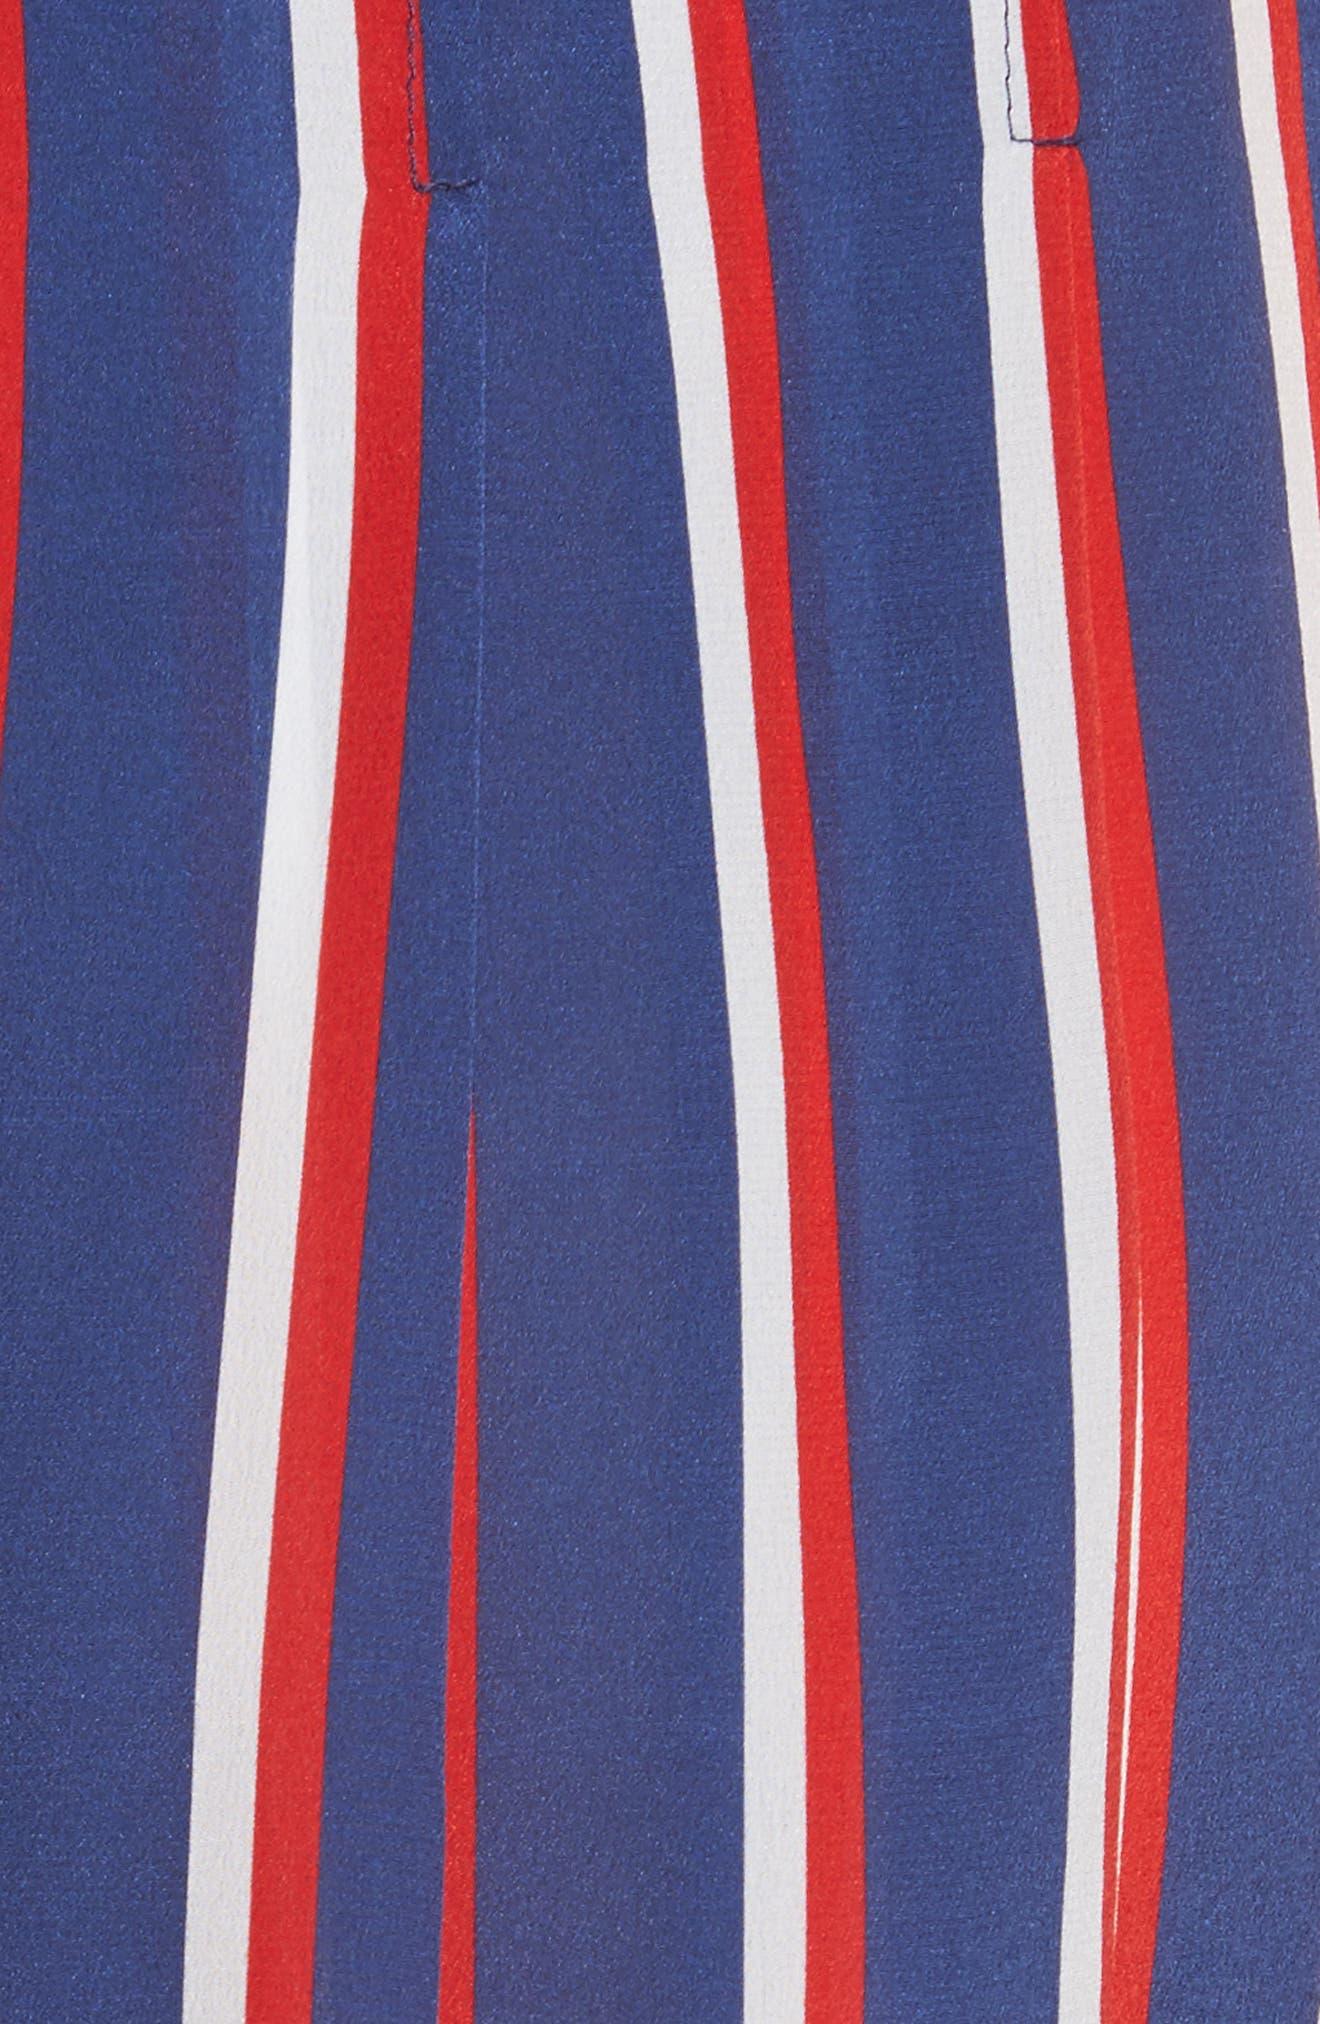 Scarlet Super High Waist Flutter Shorts,                             Alternate thumbnail 5, color,                             475